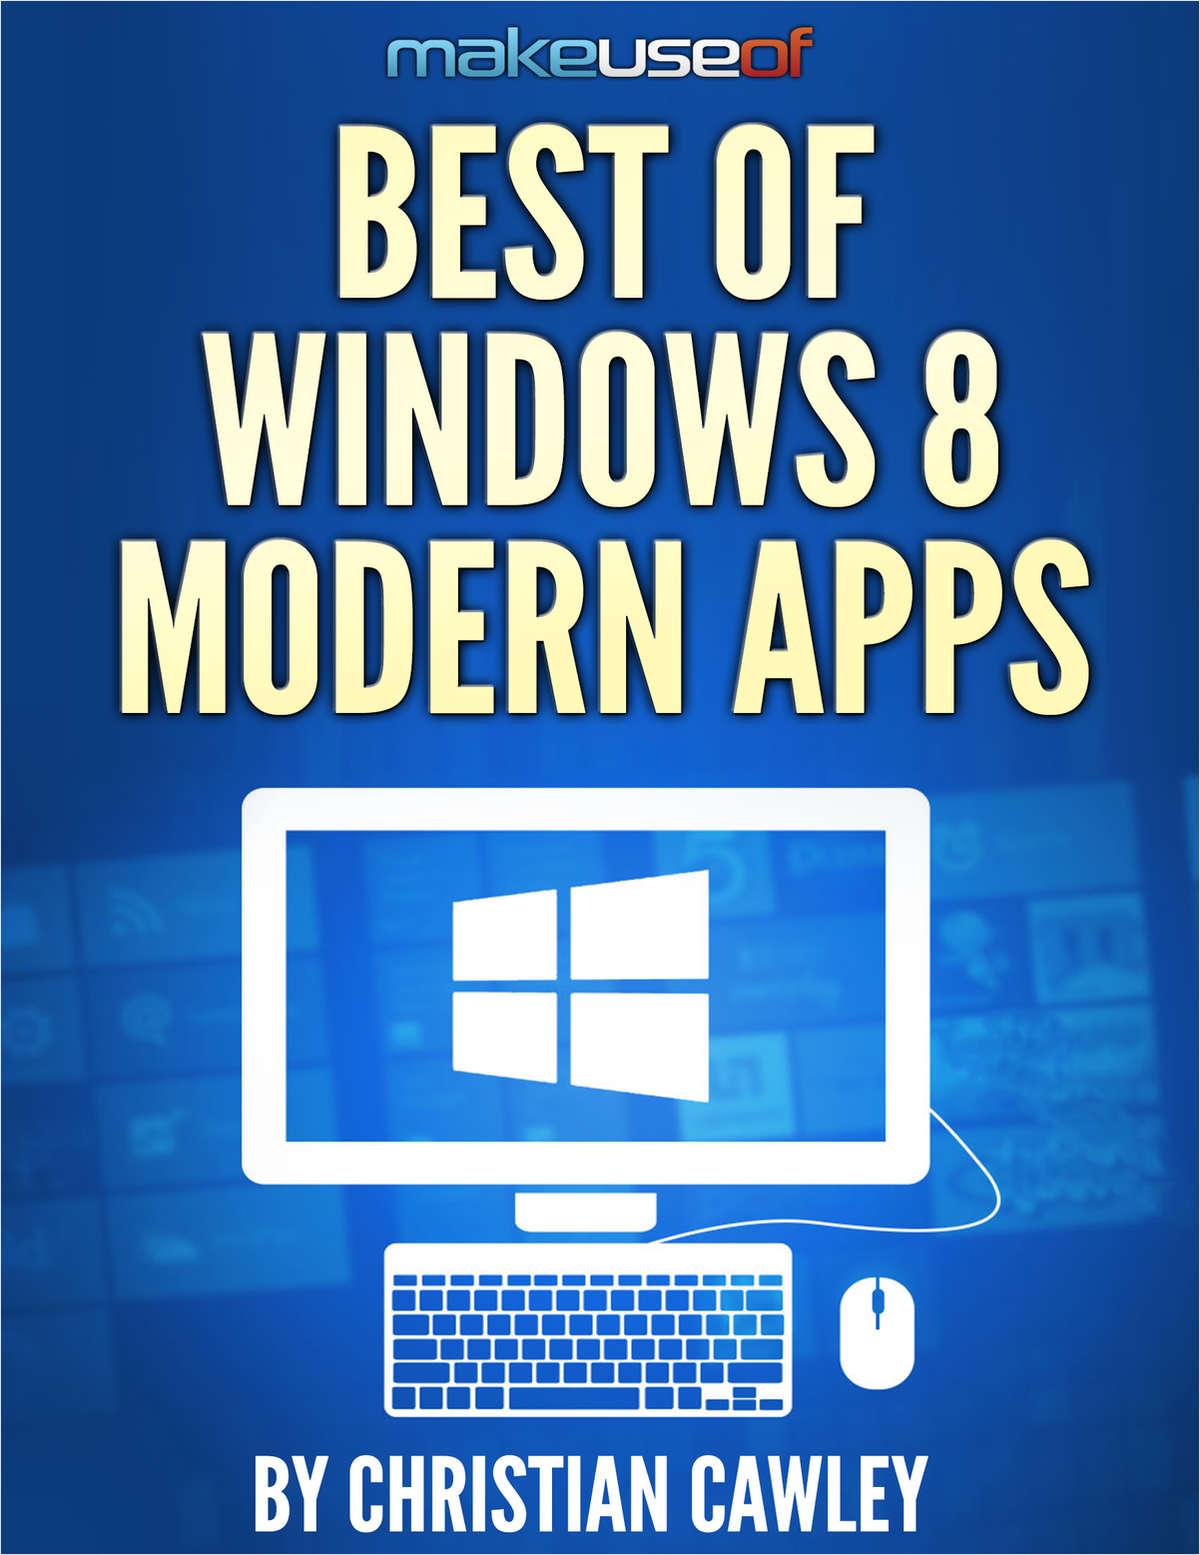 Best of Windows 8 Modern Apps